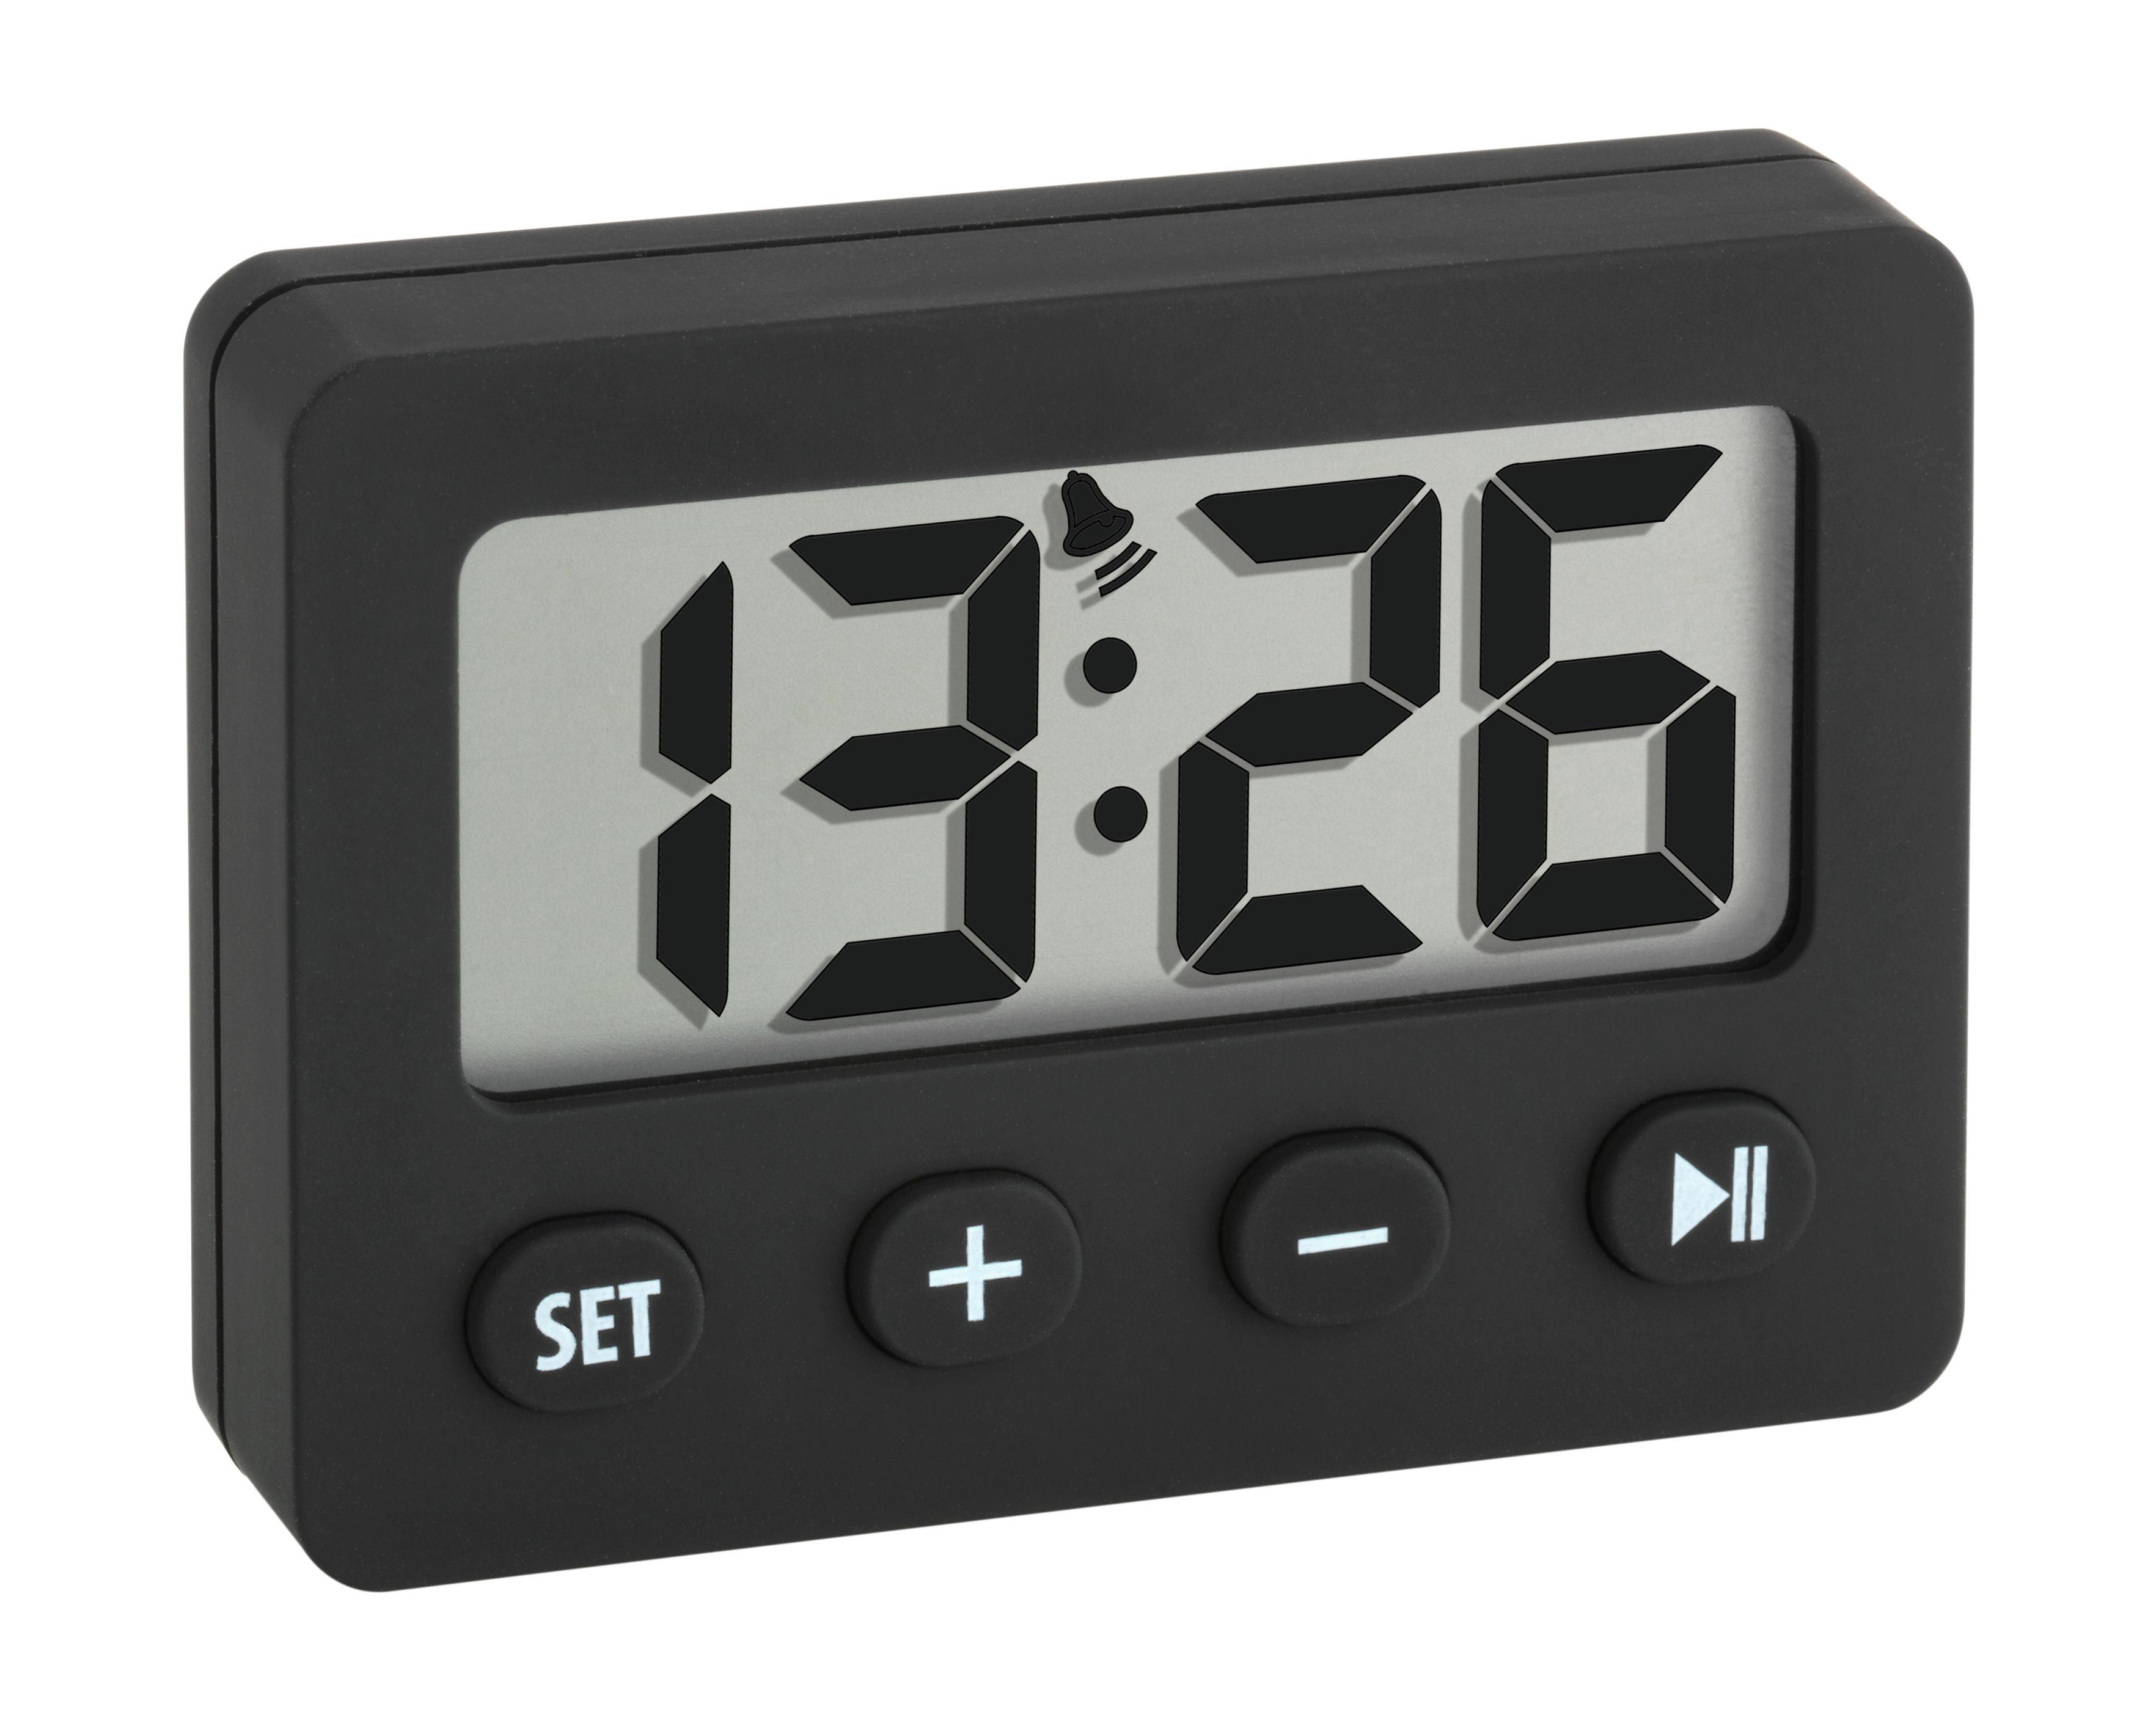 Digitale wekker met timer en stopwatch, zwart